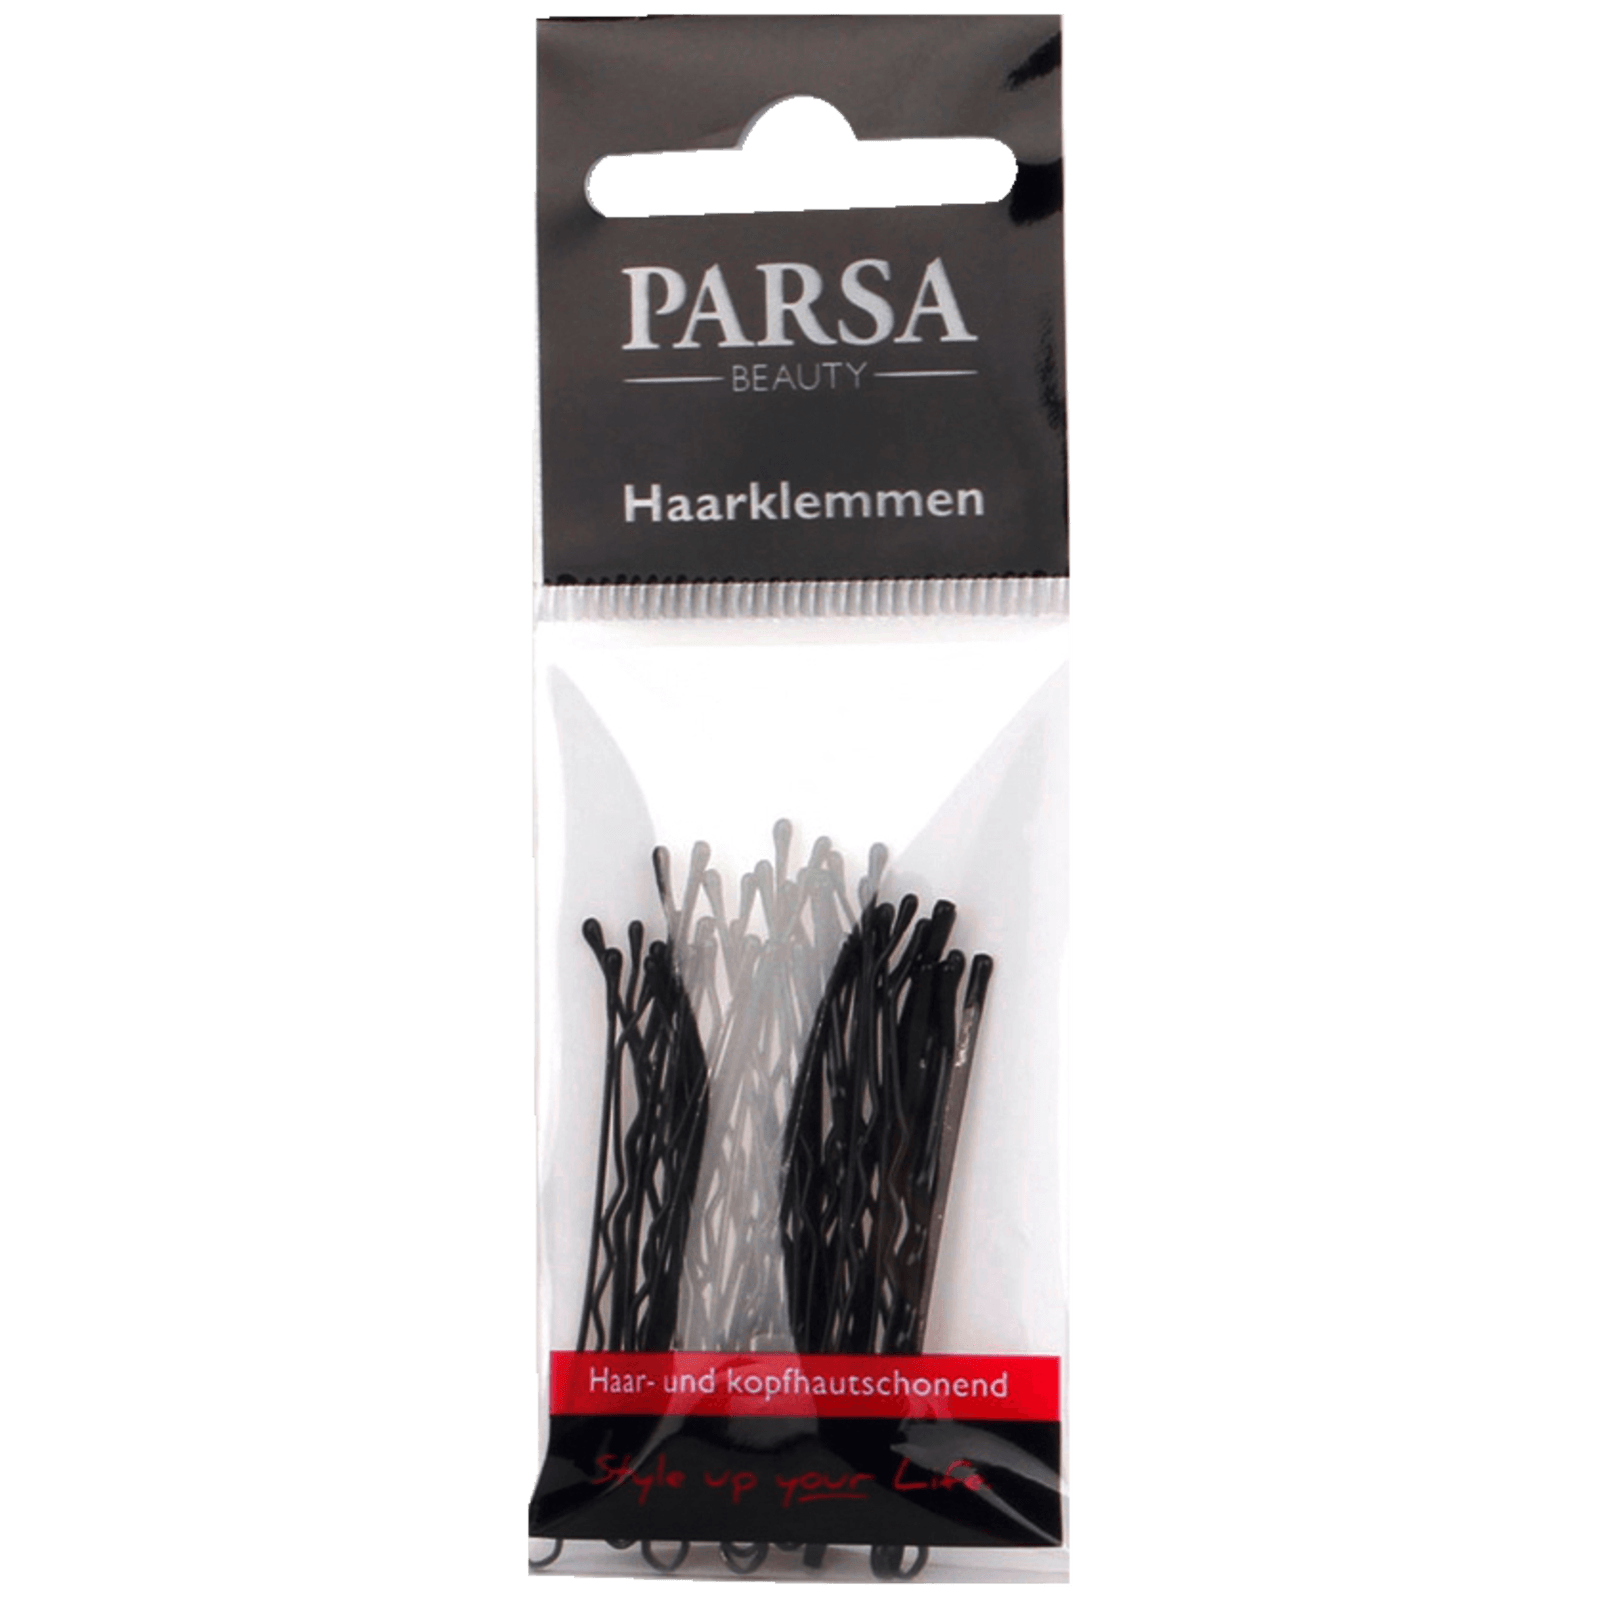 Parsa Beauty Haarklemmen